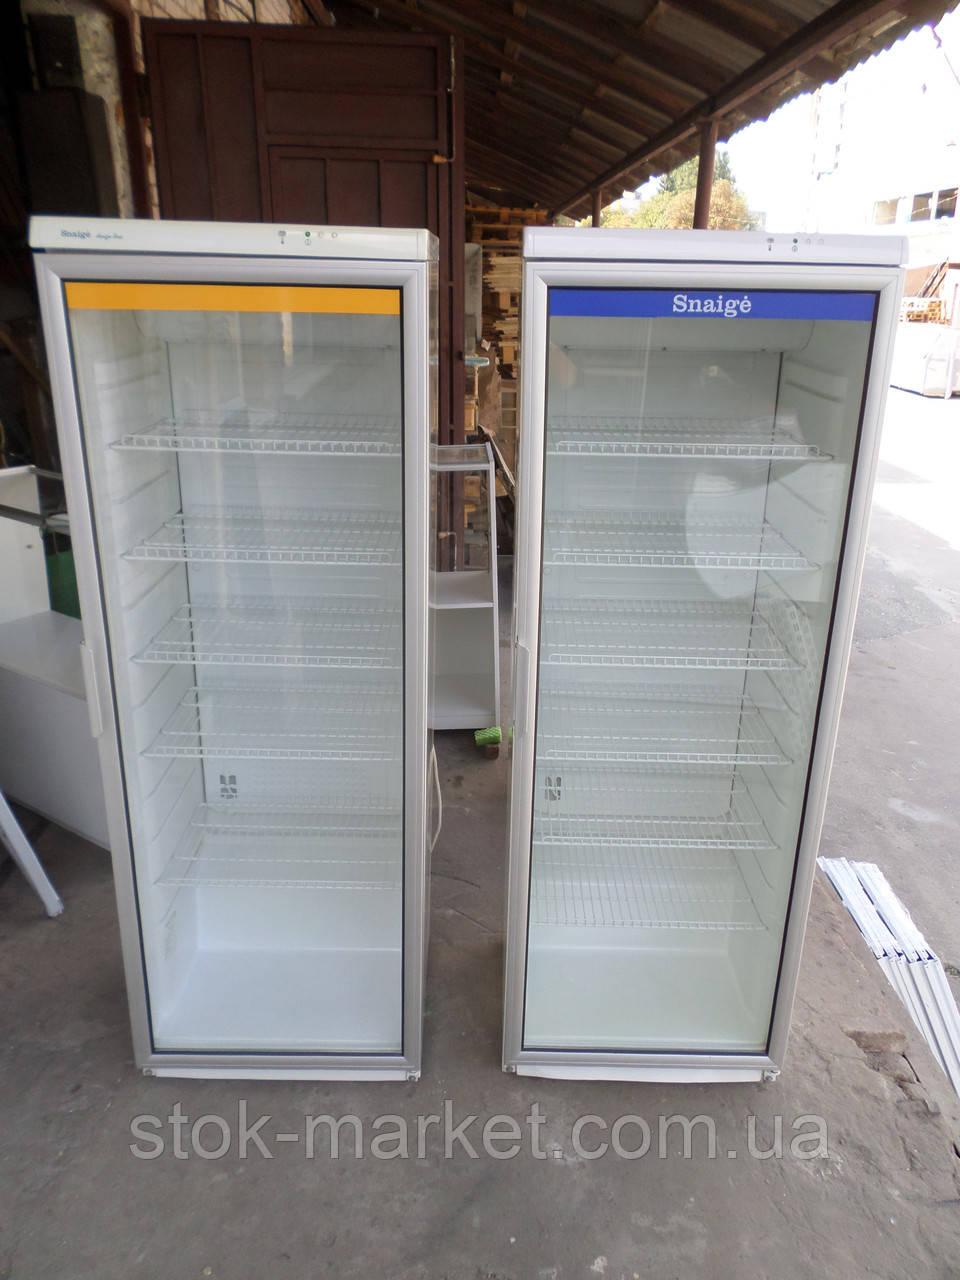 Шкаф холодильный однодверный Snaige б у, холодильный шкаф б/у